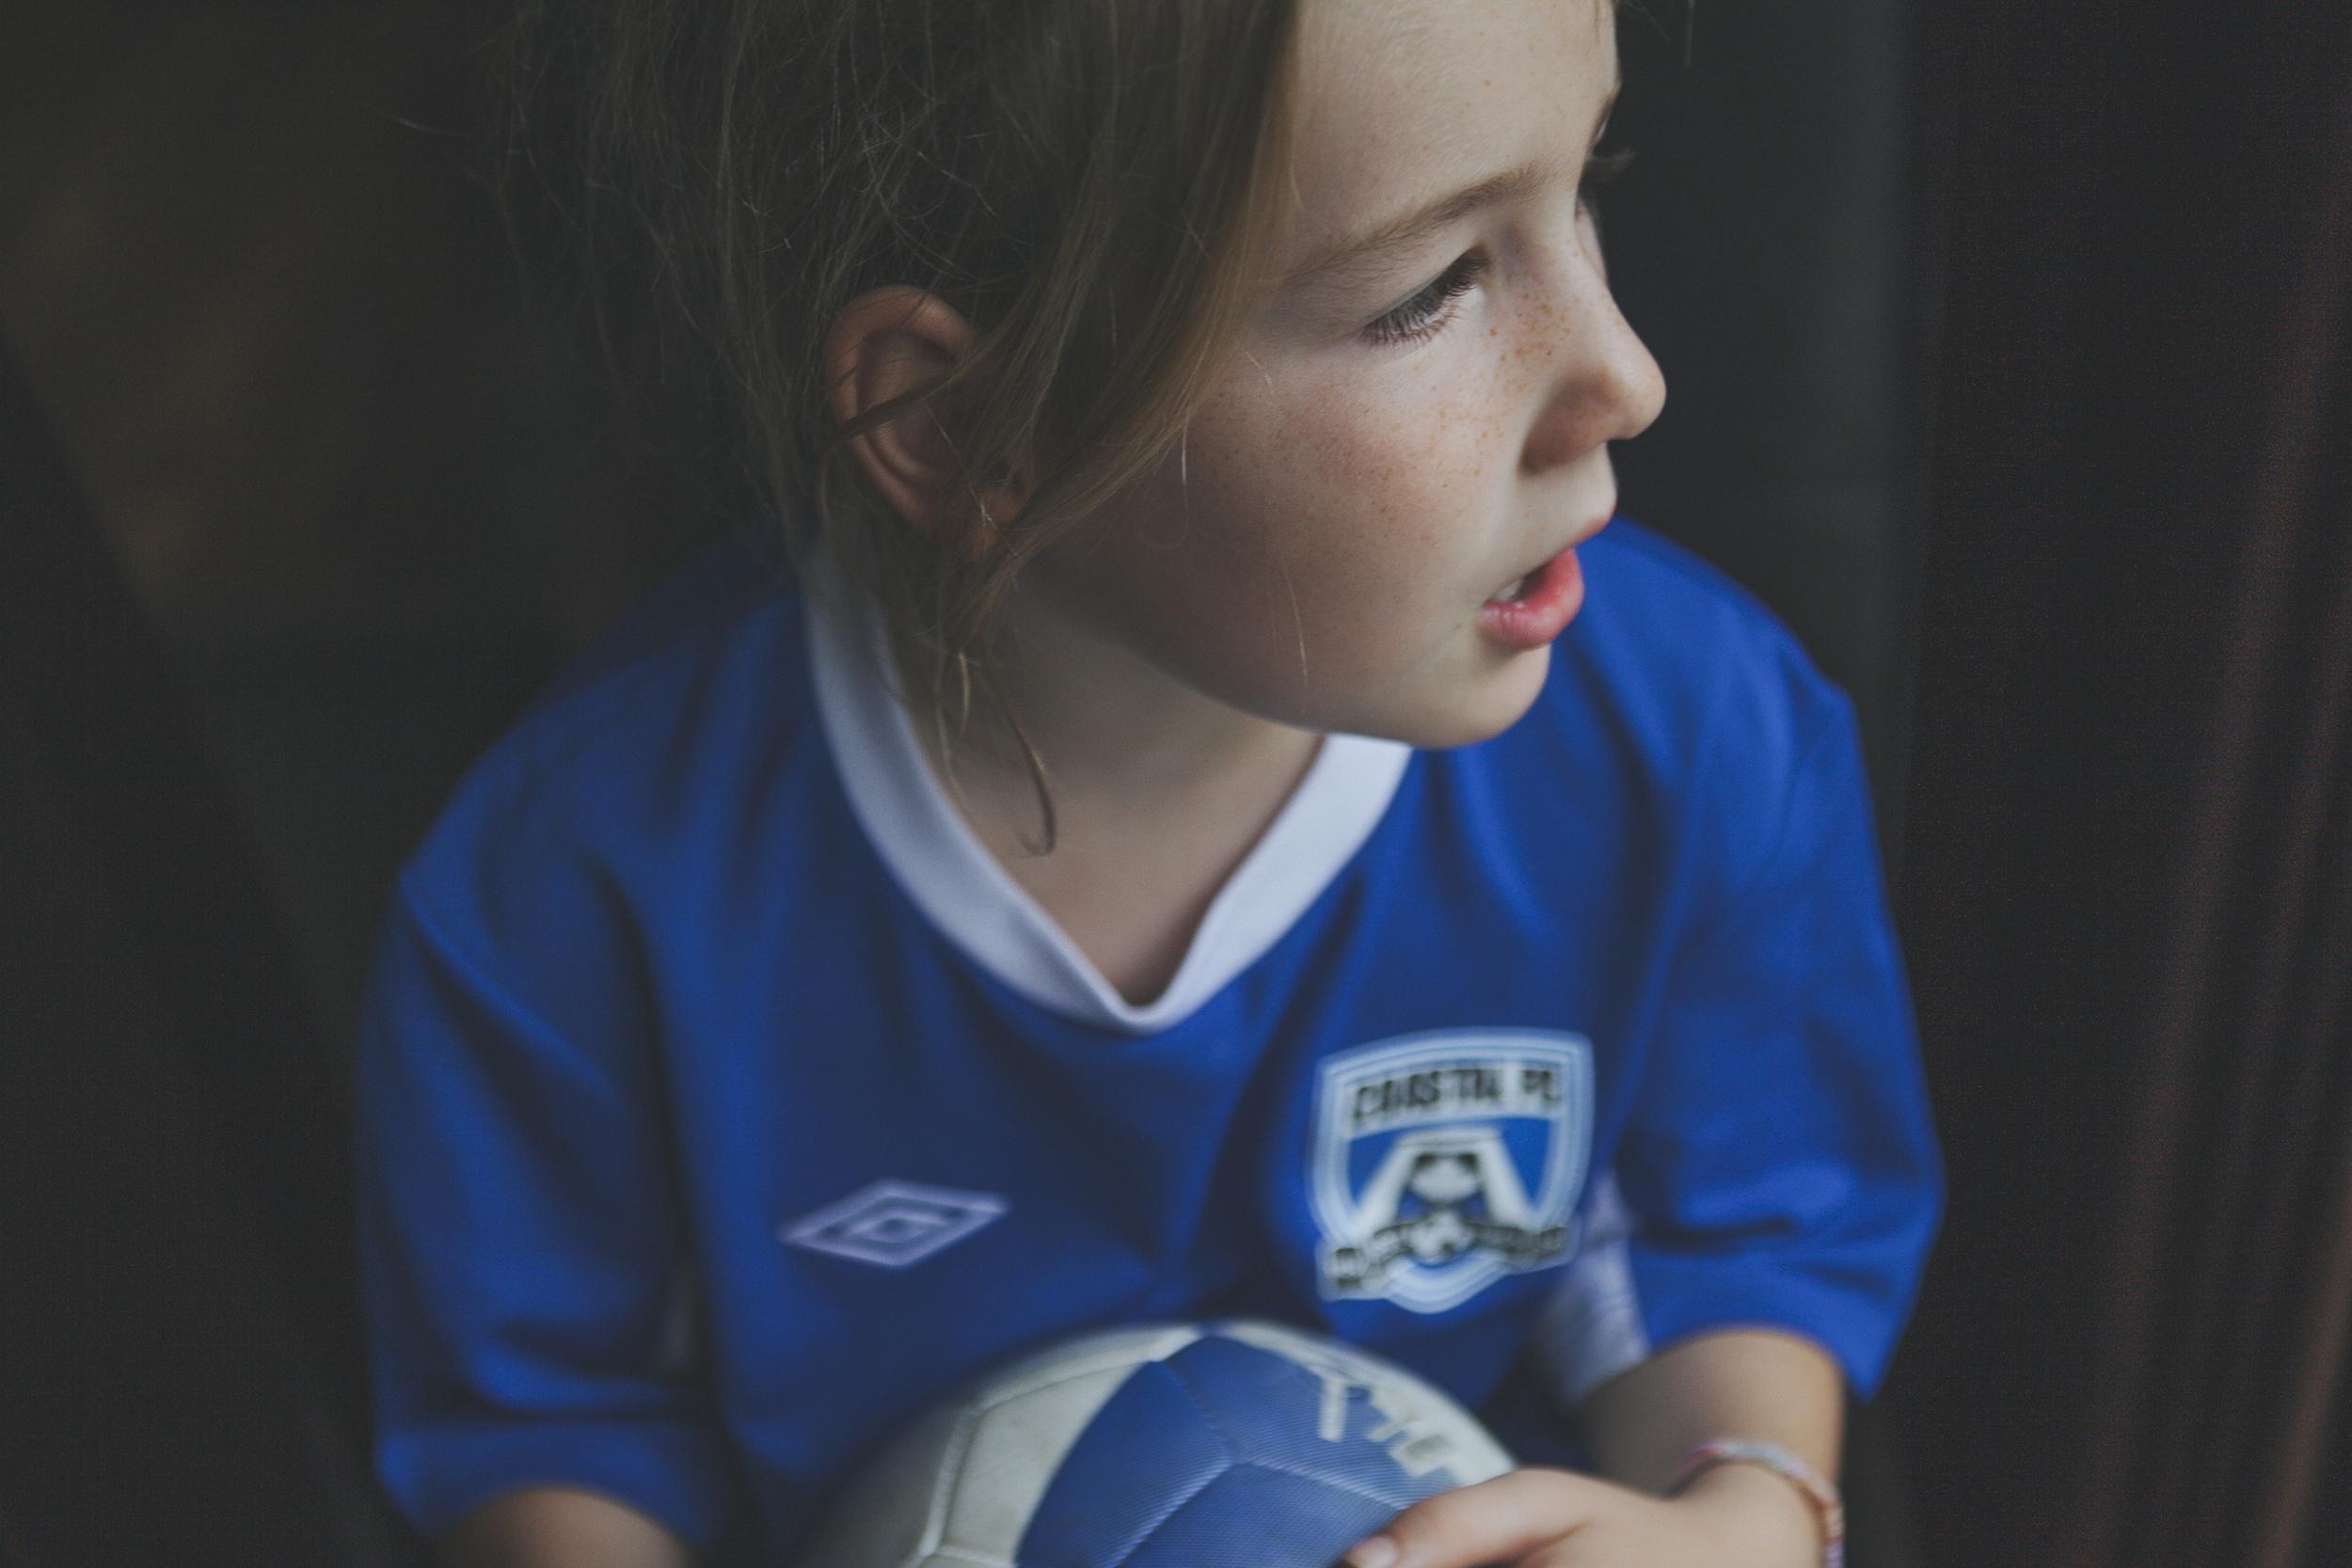 20150920-2015 amara's very first soccer game-6605.jpg